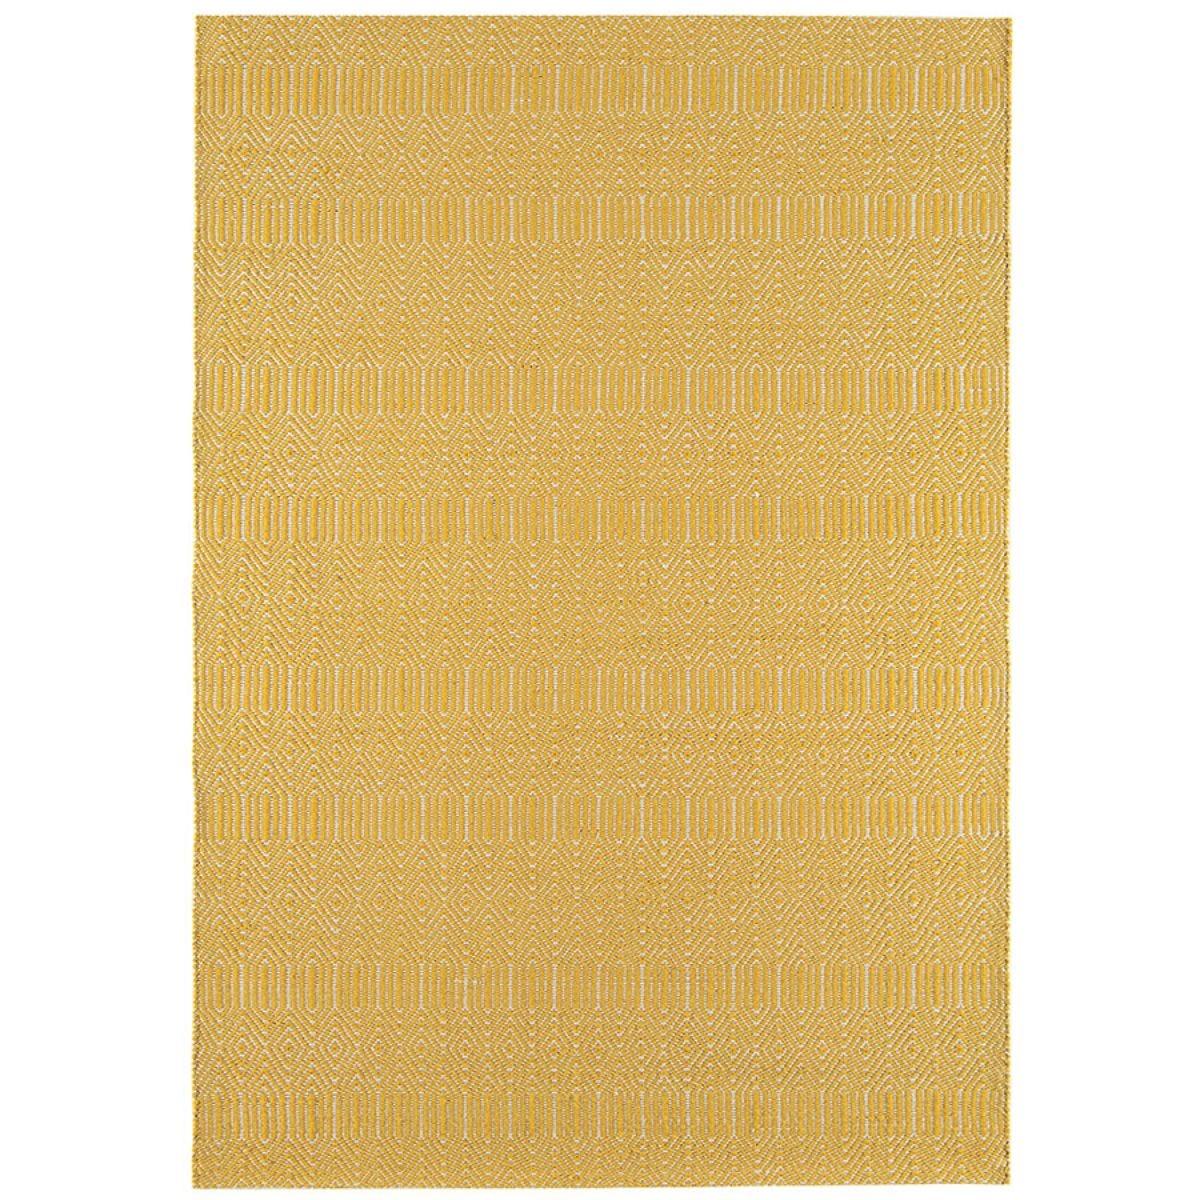 Asiatic Sloan Rug, 160 x 230cm - Mustard